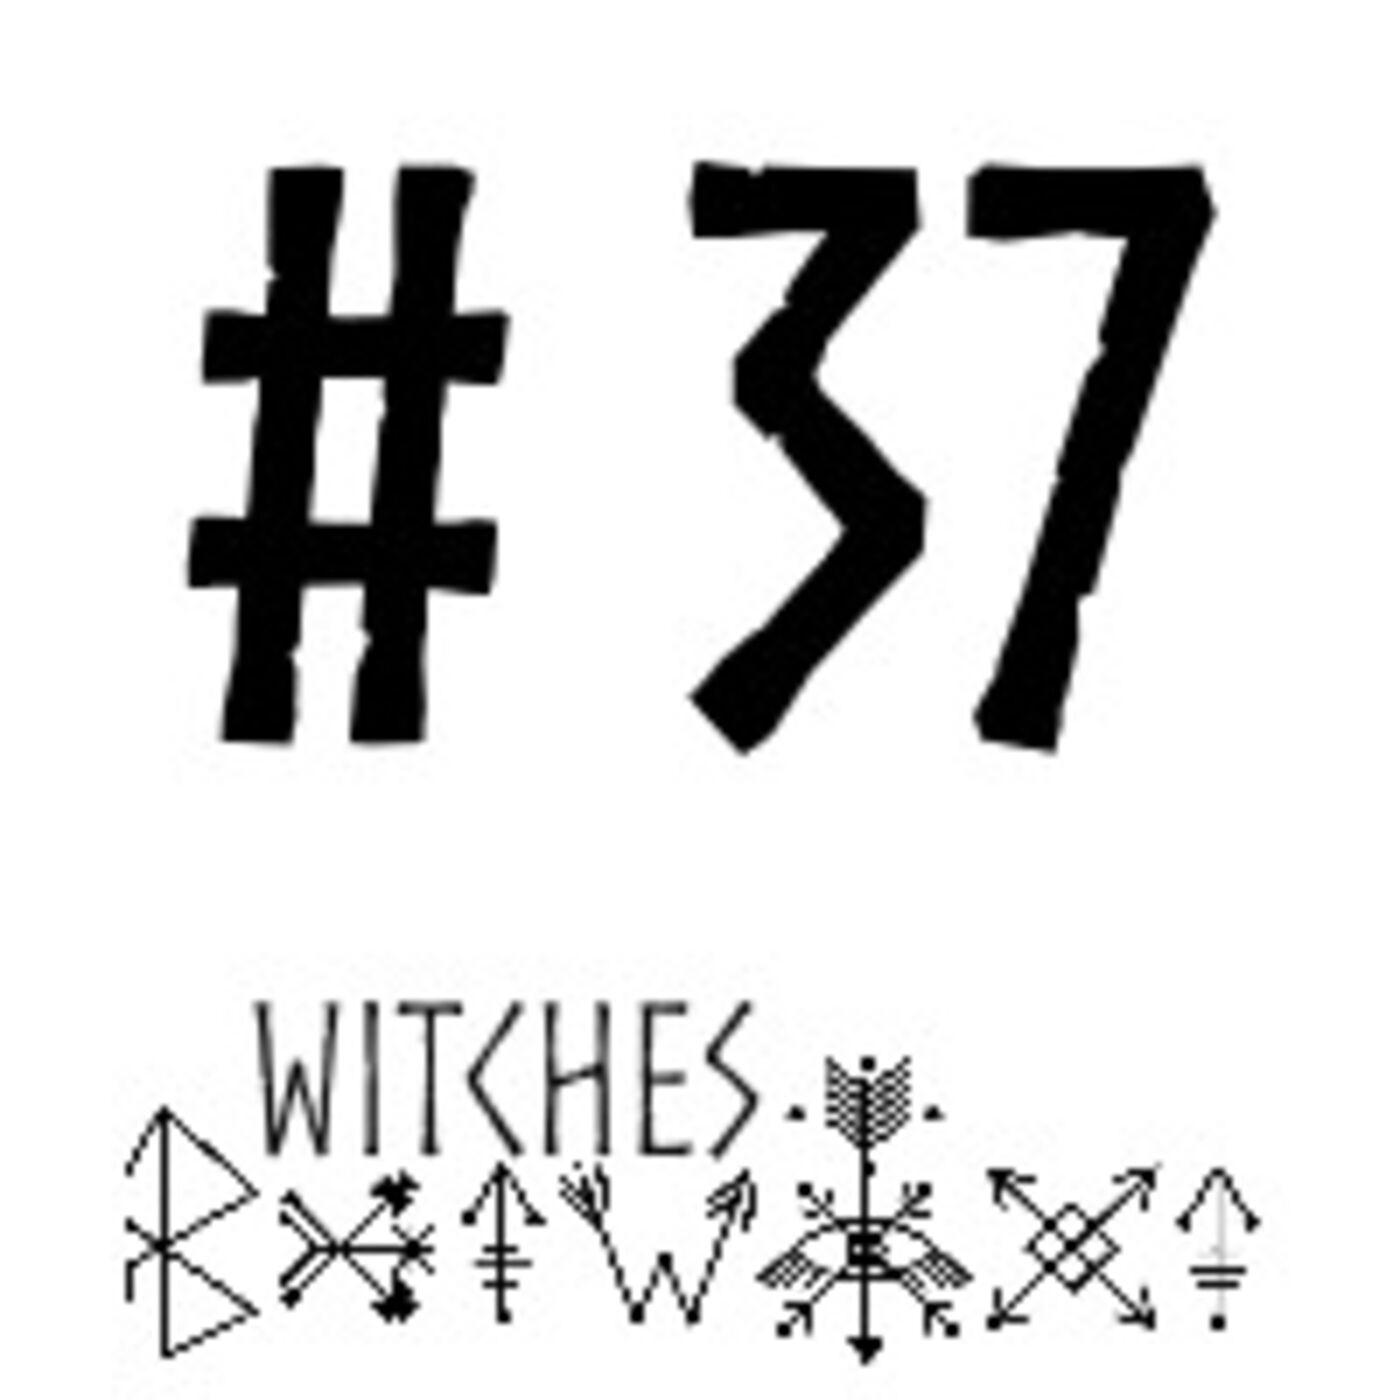 WBTWXT EP #37 - How do you handle multiple responsibilties?